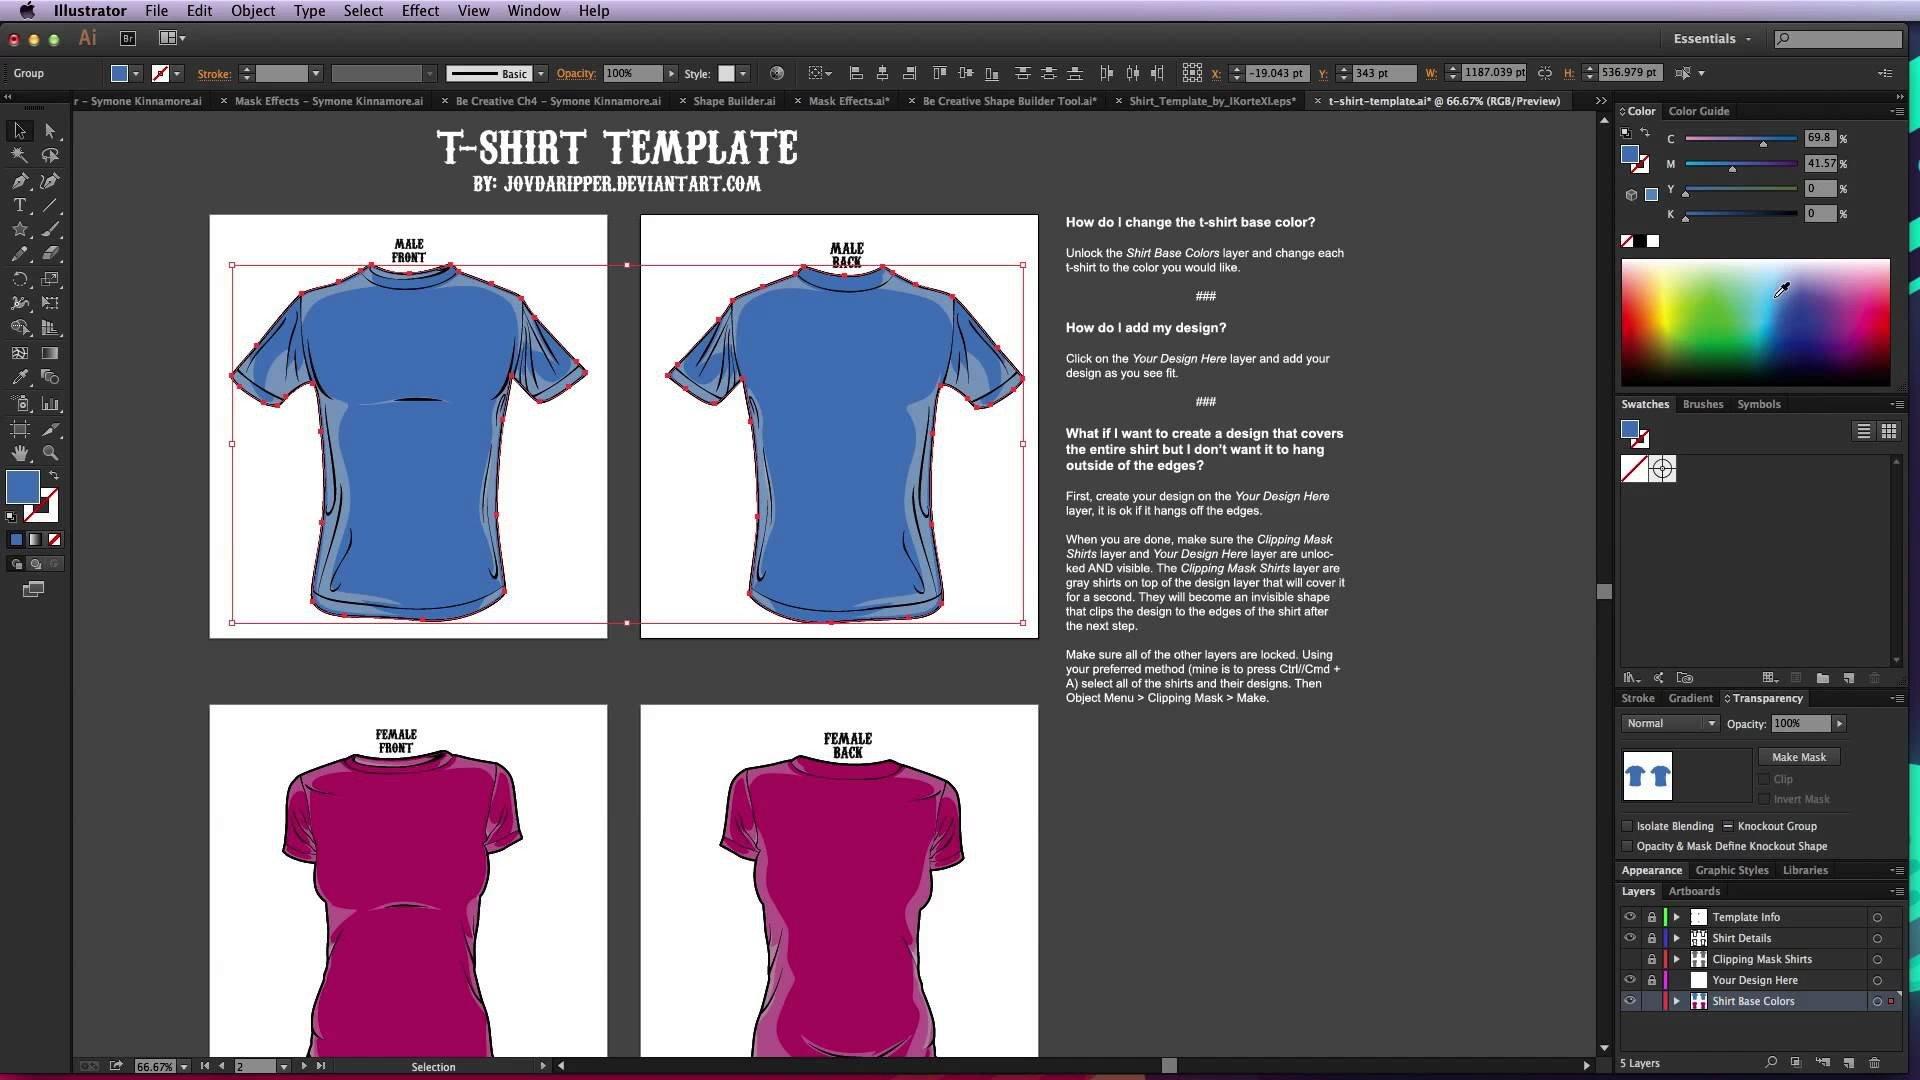 T Shirt Design Template Illustrator Adobe Illustrator T Shirt Design Template Templates Data